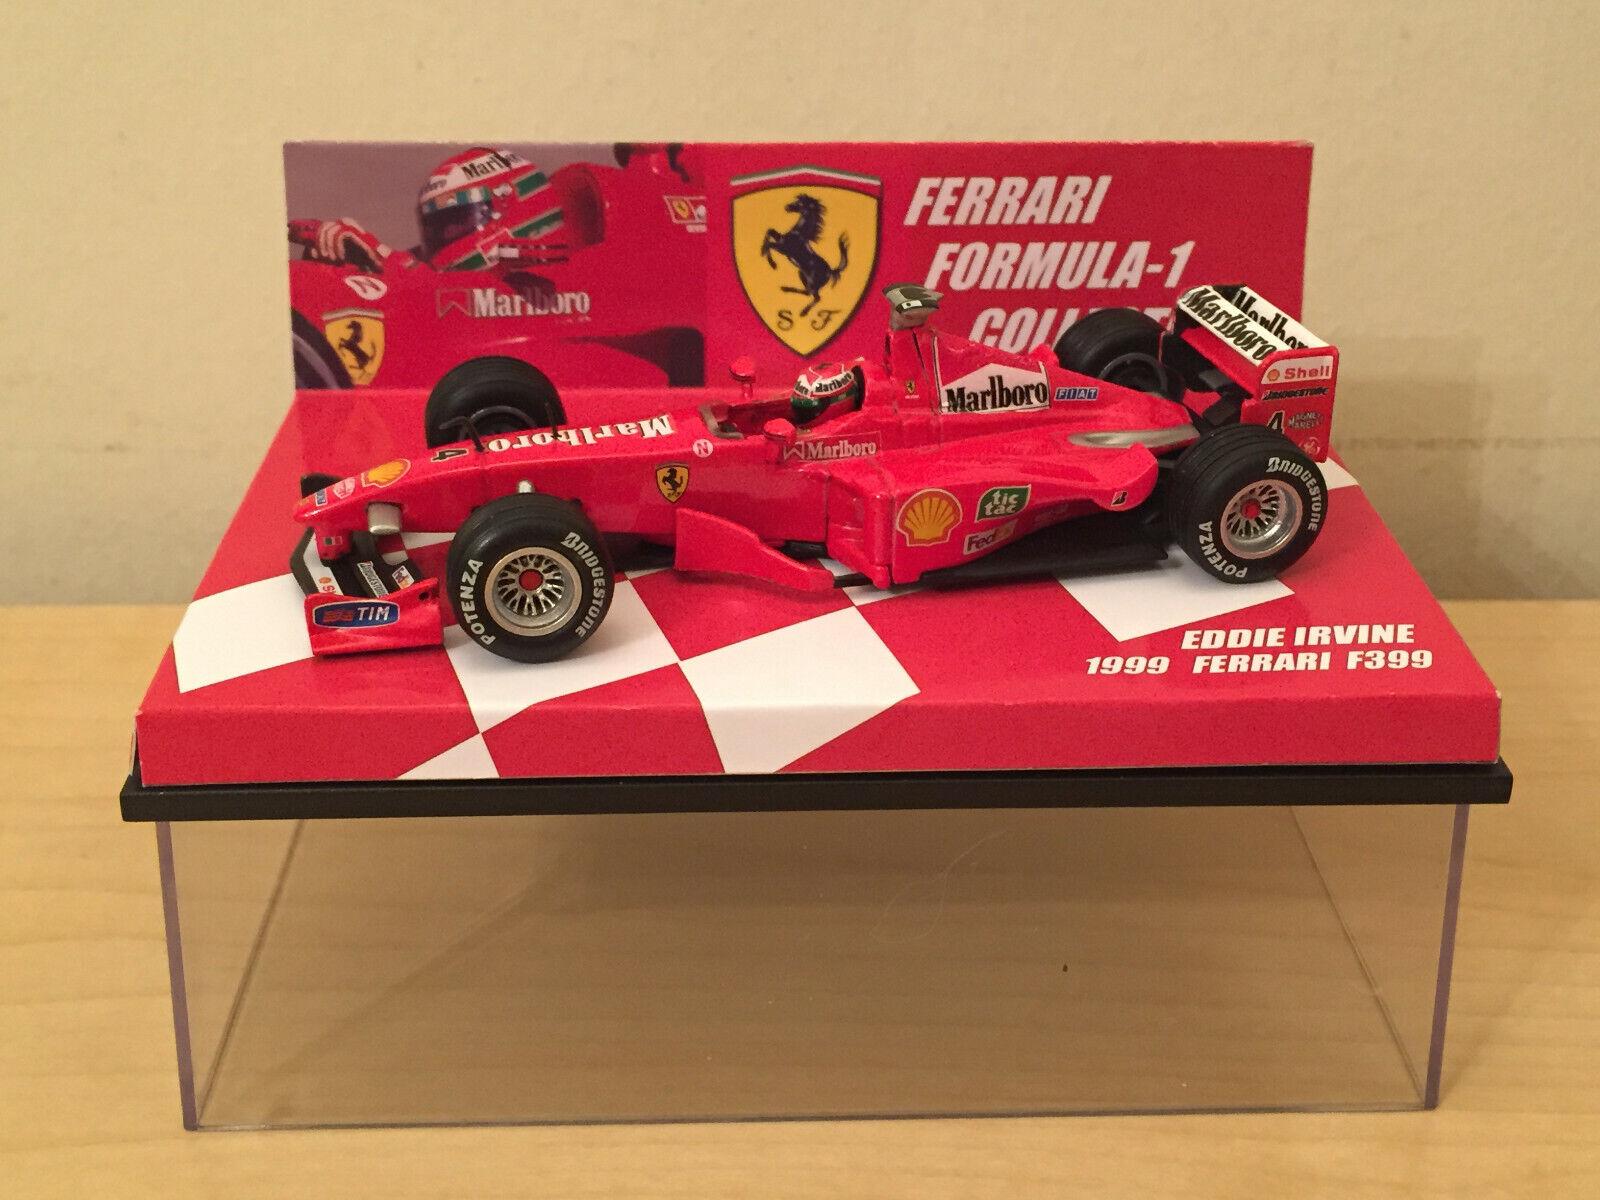 1 43 Hot Wheels Ferrari F399 1999 Eddie Irvine con plena librea de tabaco